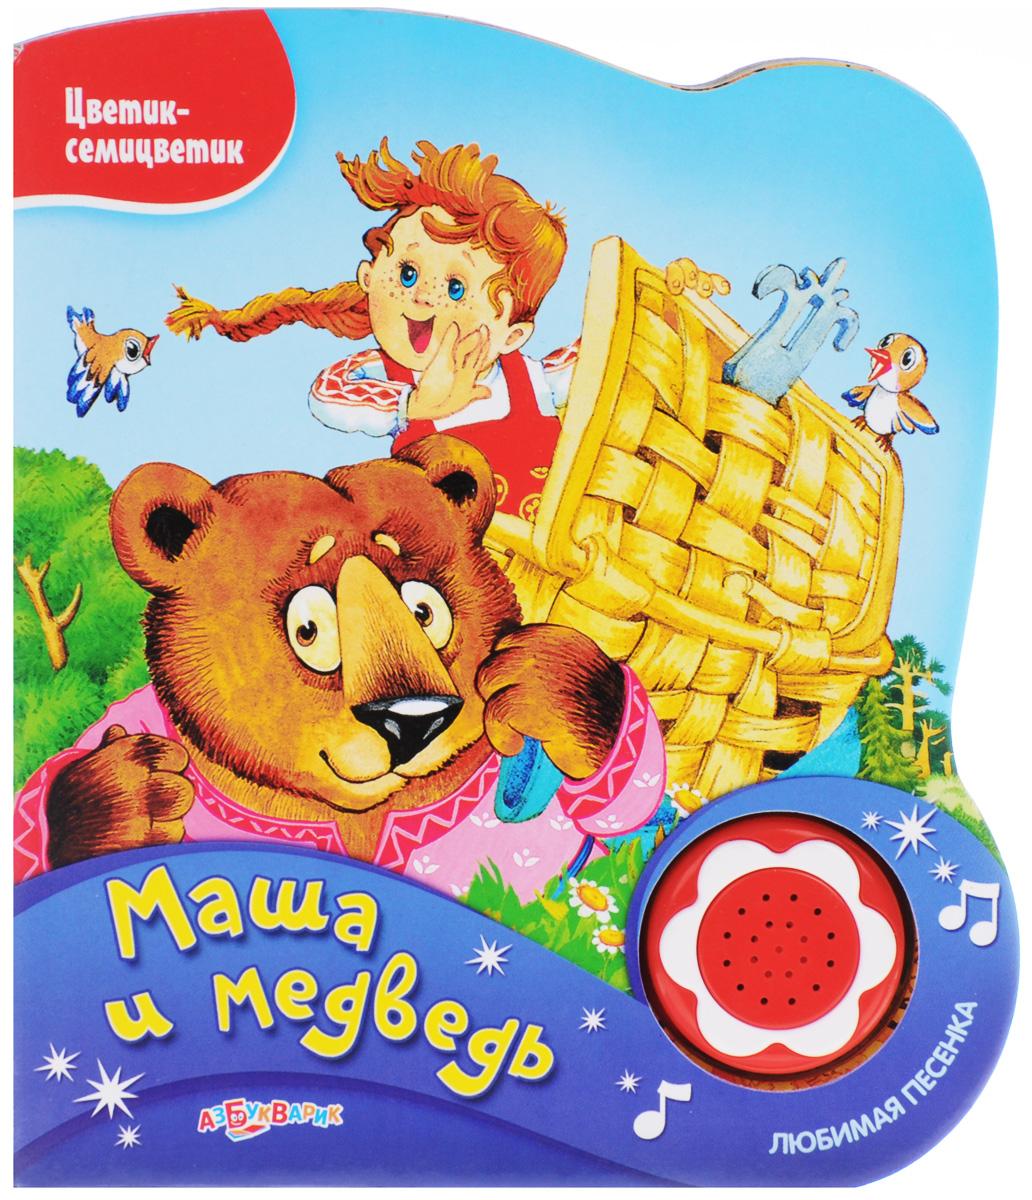 Сост. Ильченко С. Маша и медведь. Книжка-игрушка гуричева е сост маша и медведь алфавит